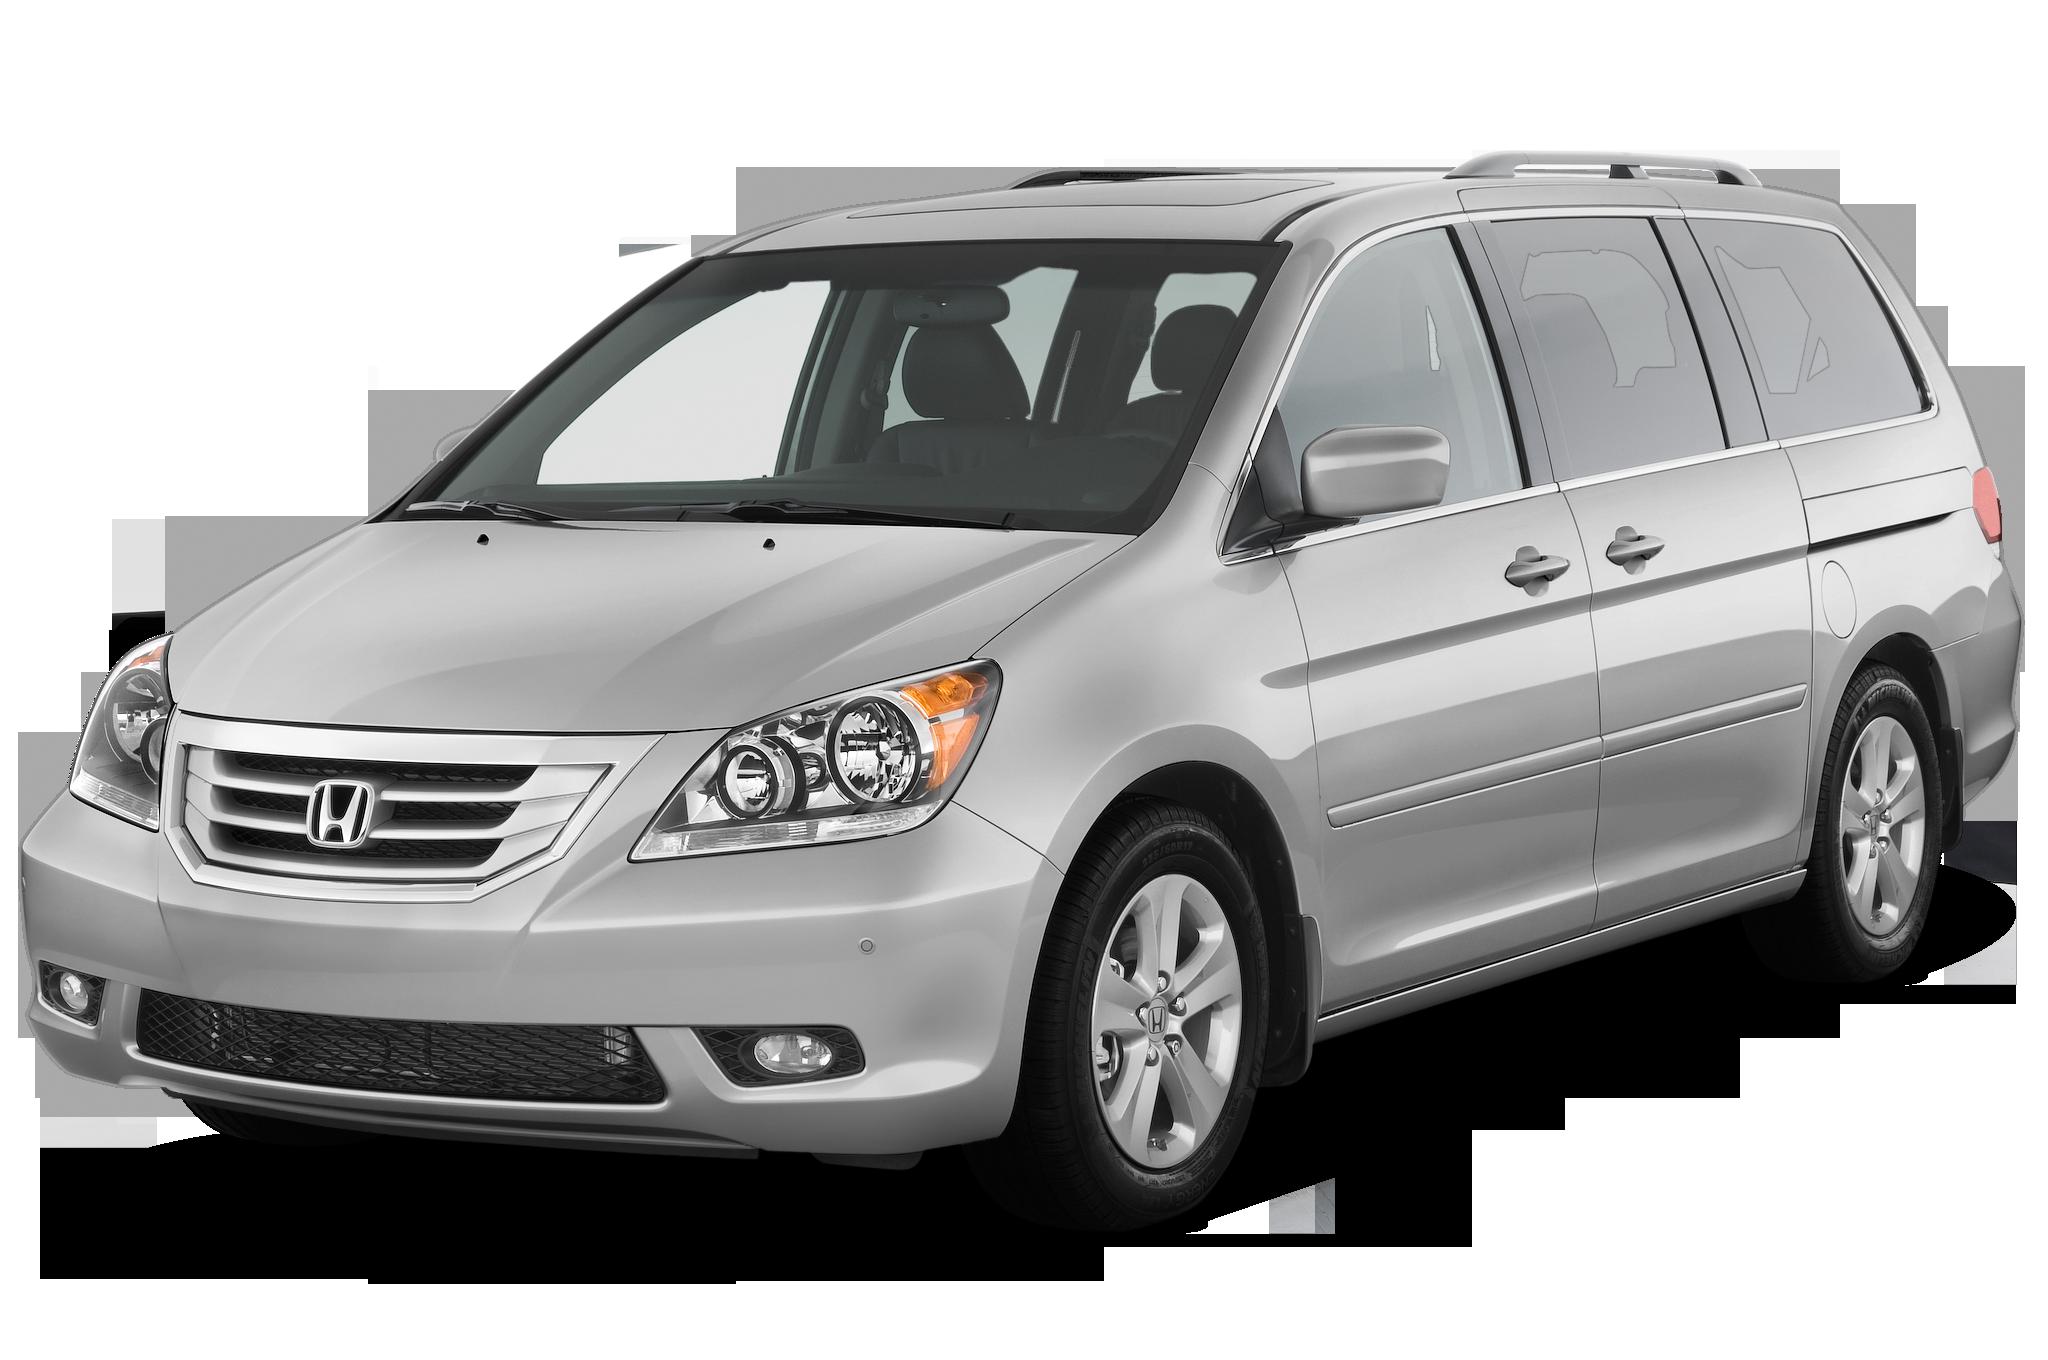 Honda Odyssey (North America) III 2005 - 2010 Minivan ...